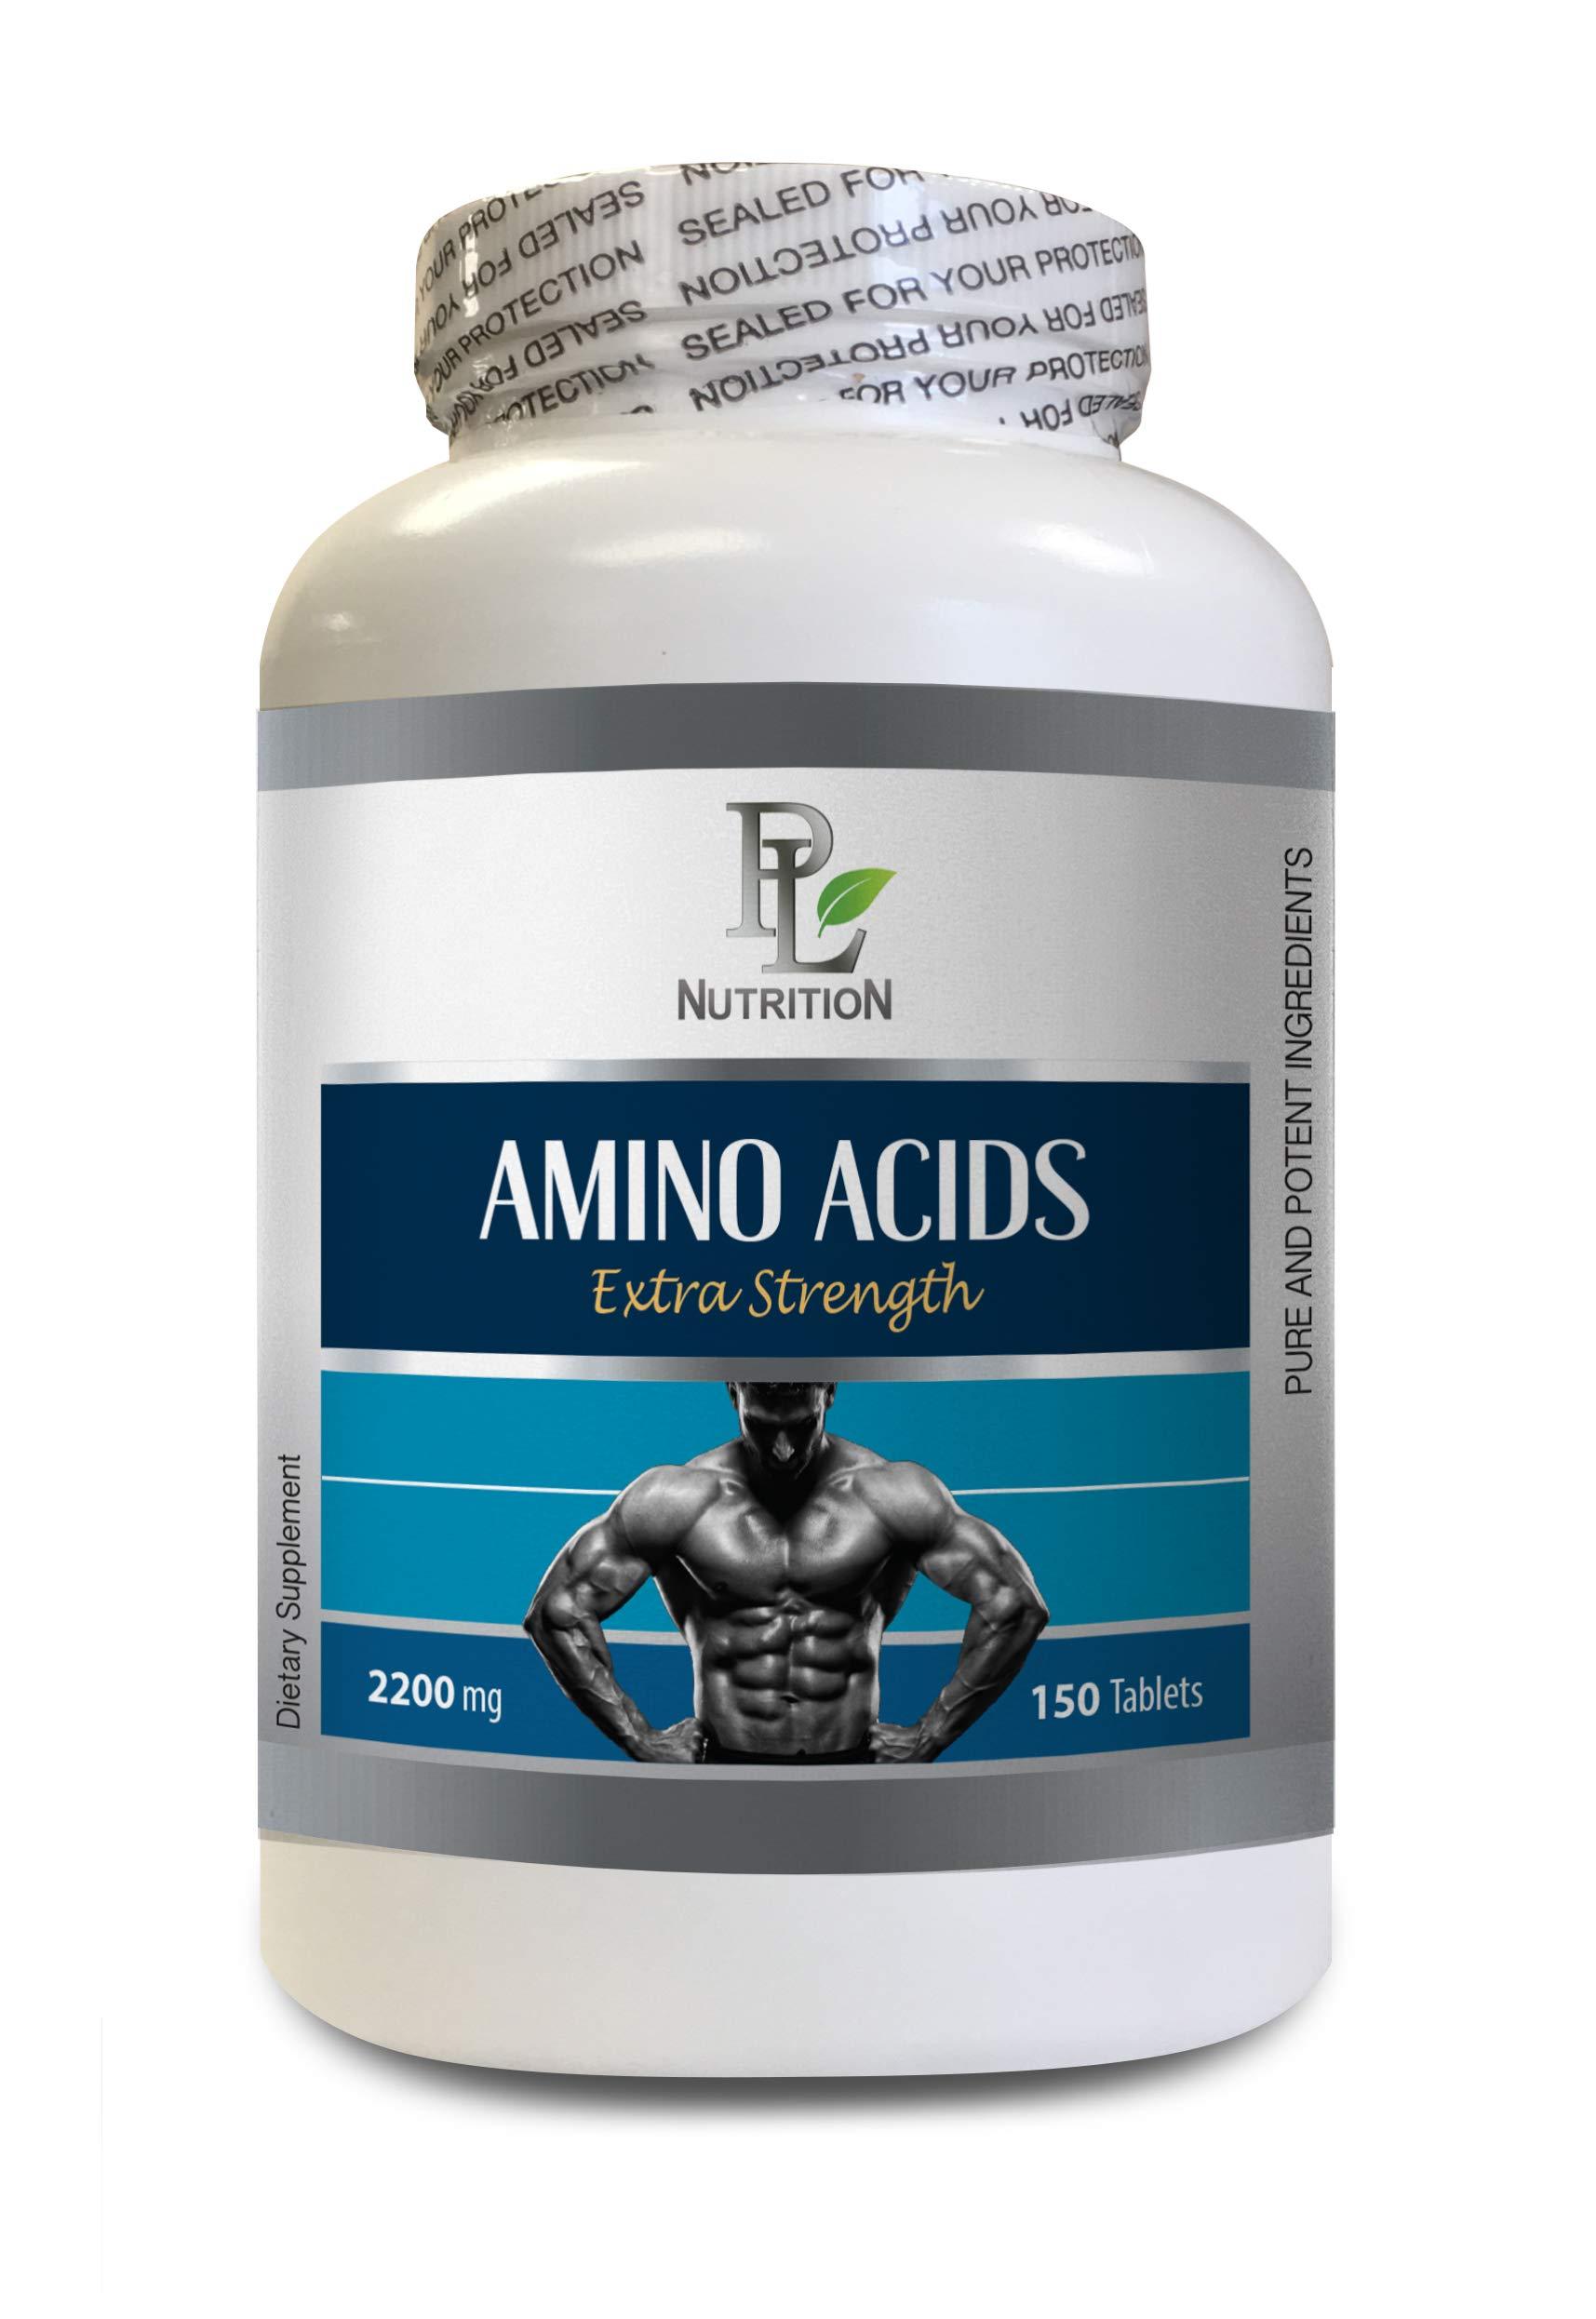 Bodybuilding Supplements Natural - Amino ACIDS 2200mg - Extra Strength - Amino acids Supplements Post Workout - 1 Bottle 150 Tablets